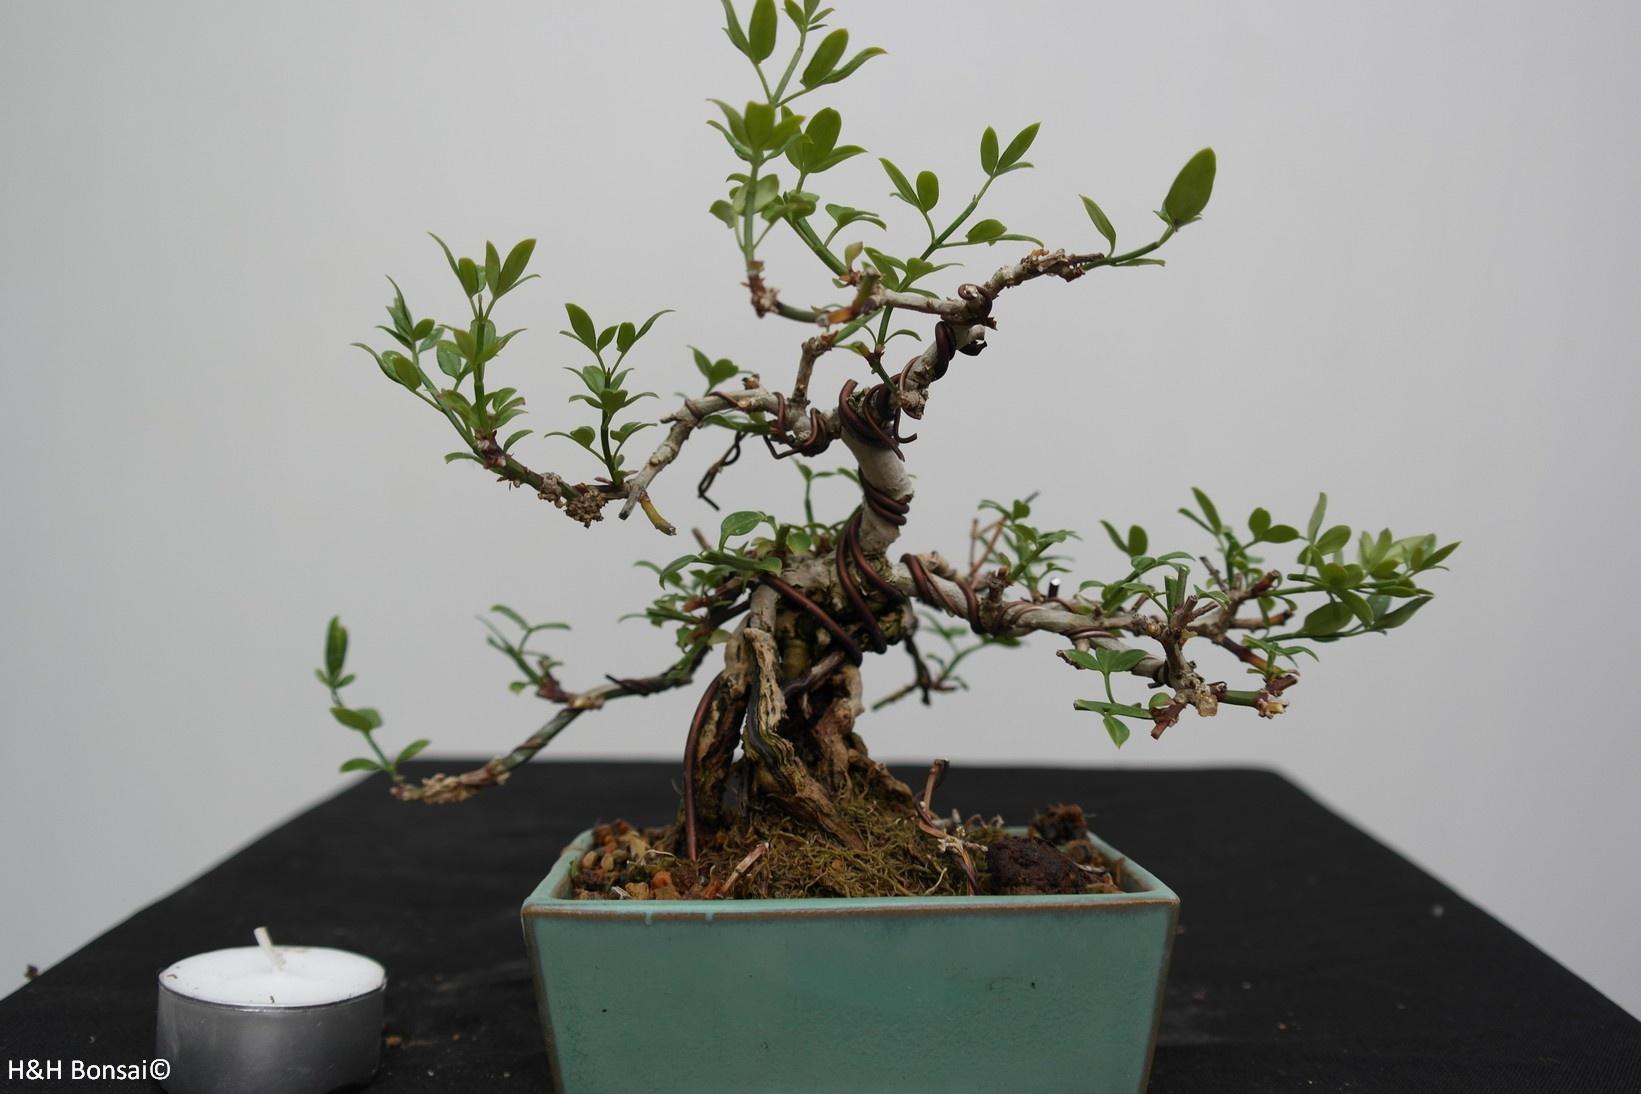 Bonsai ShohinGelsomino d'inverno, Jasminum nudiflorum, no. 7528